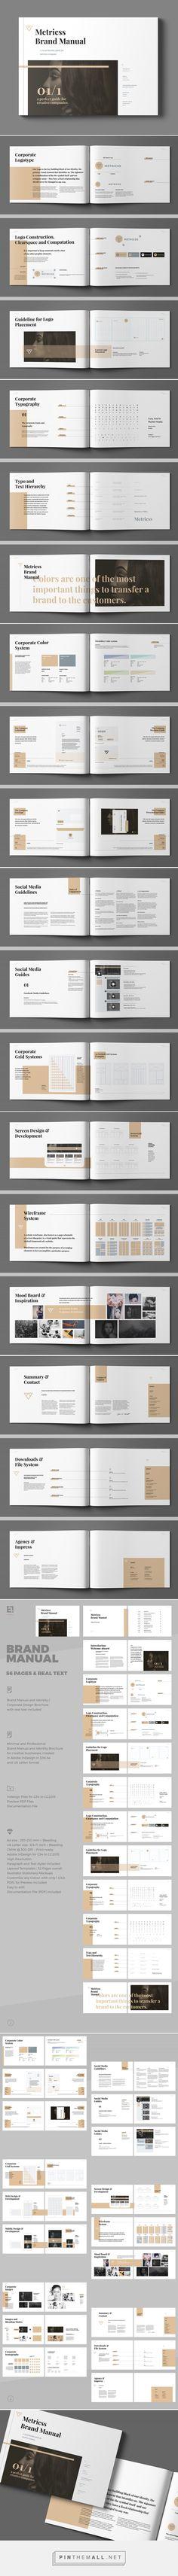 Brand Manual on Behance - created via https://pinthemall.net